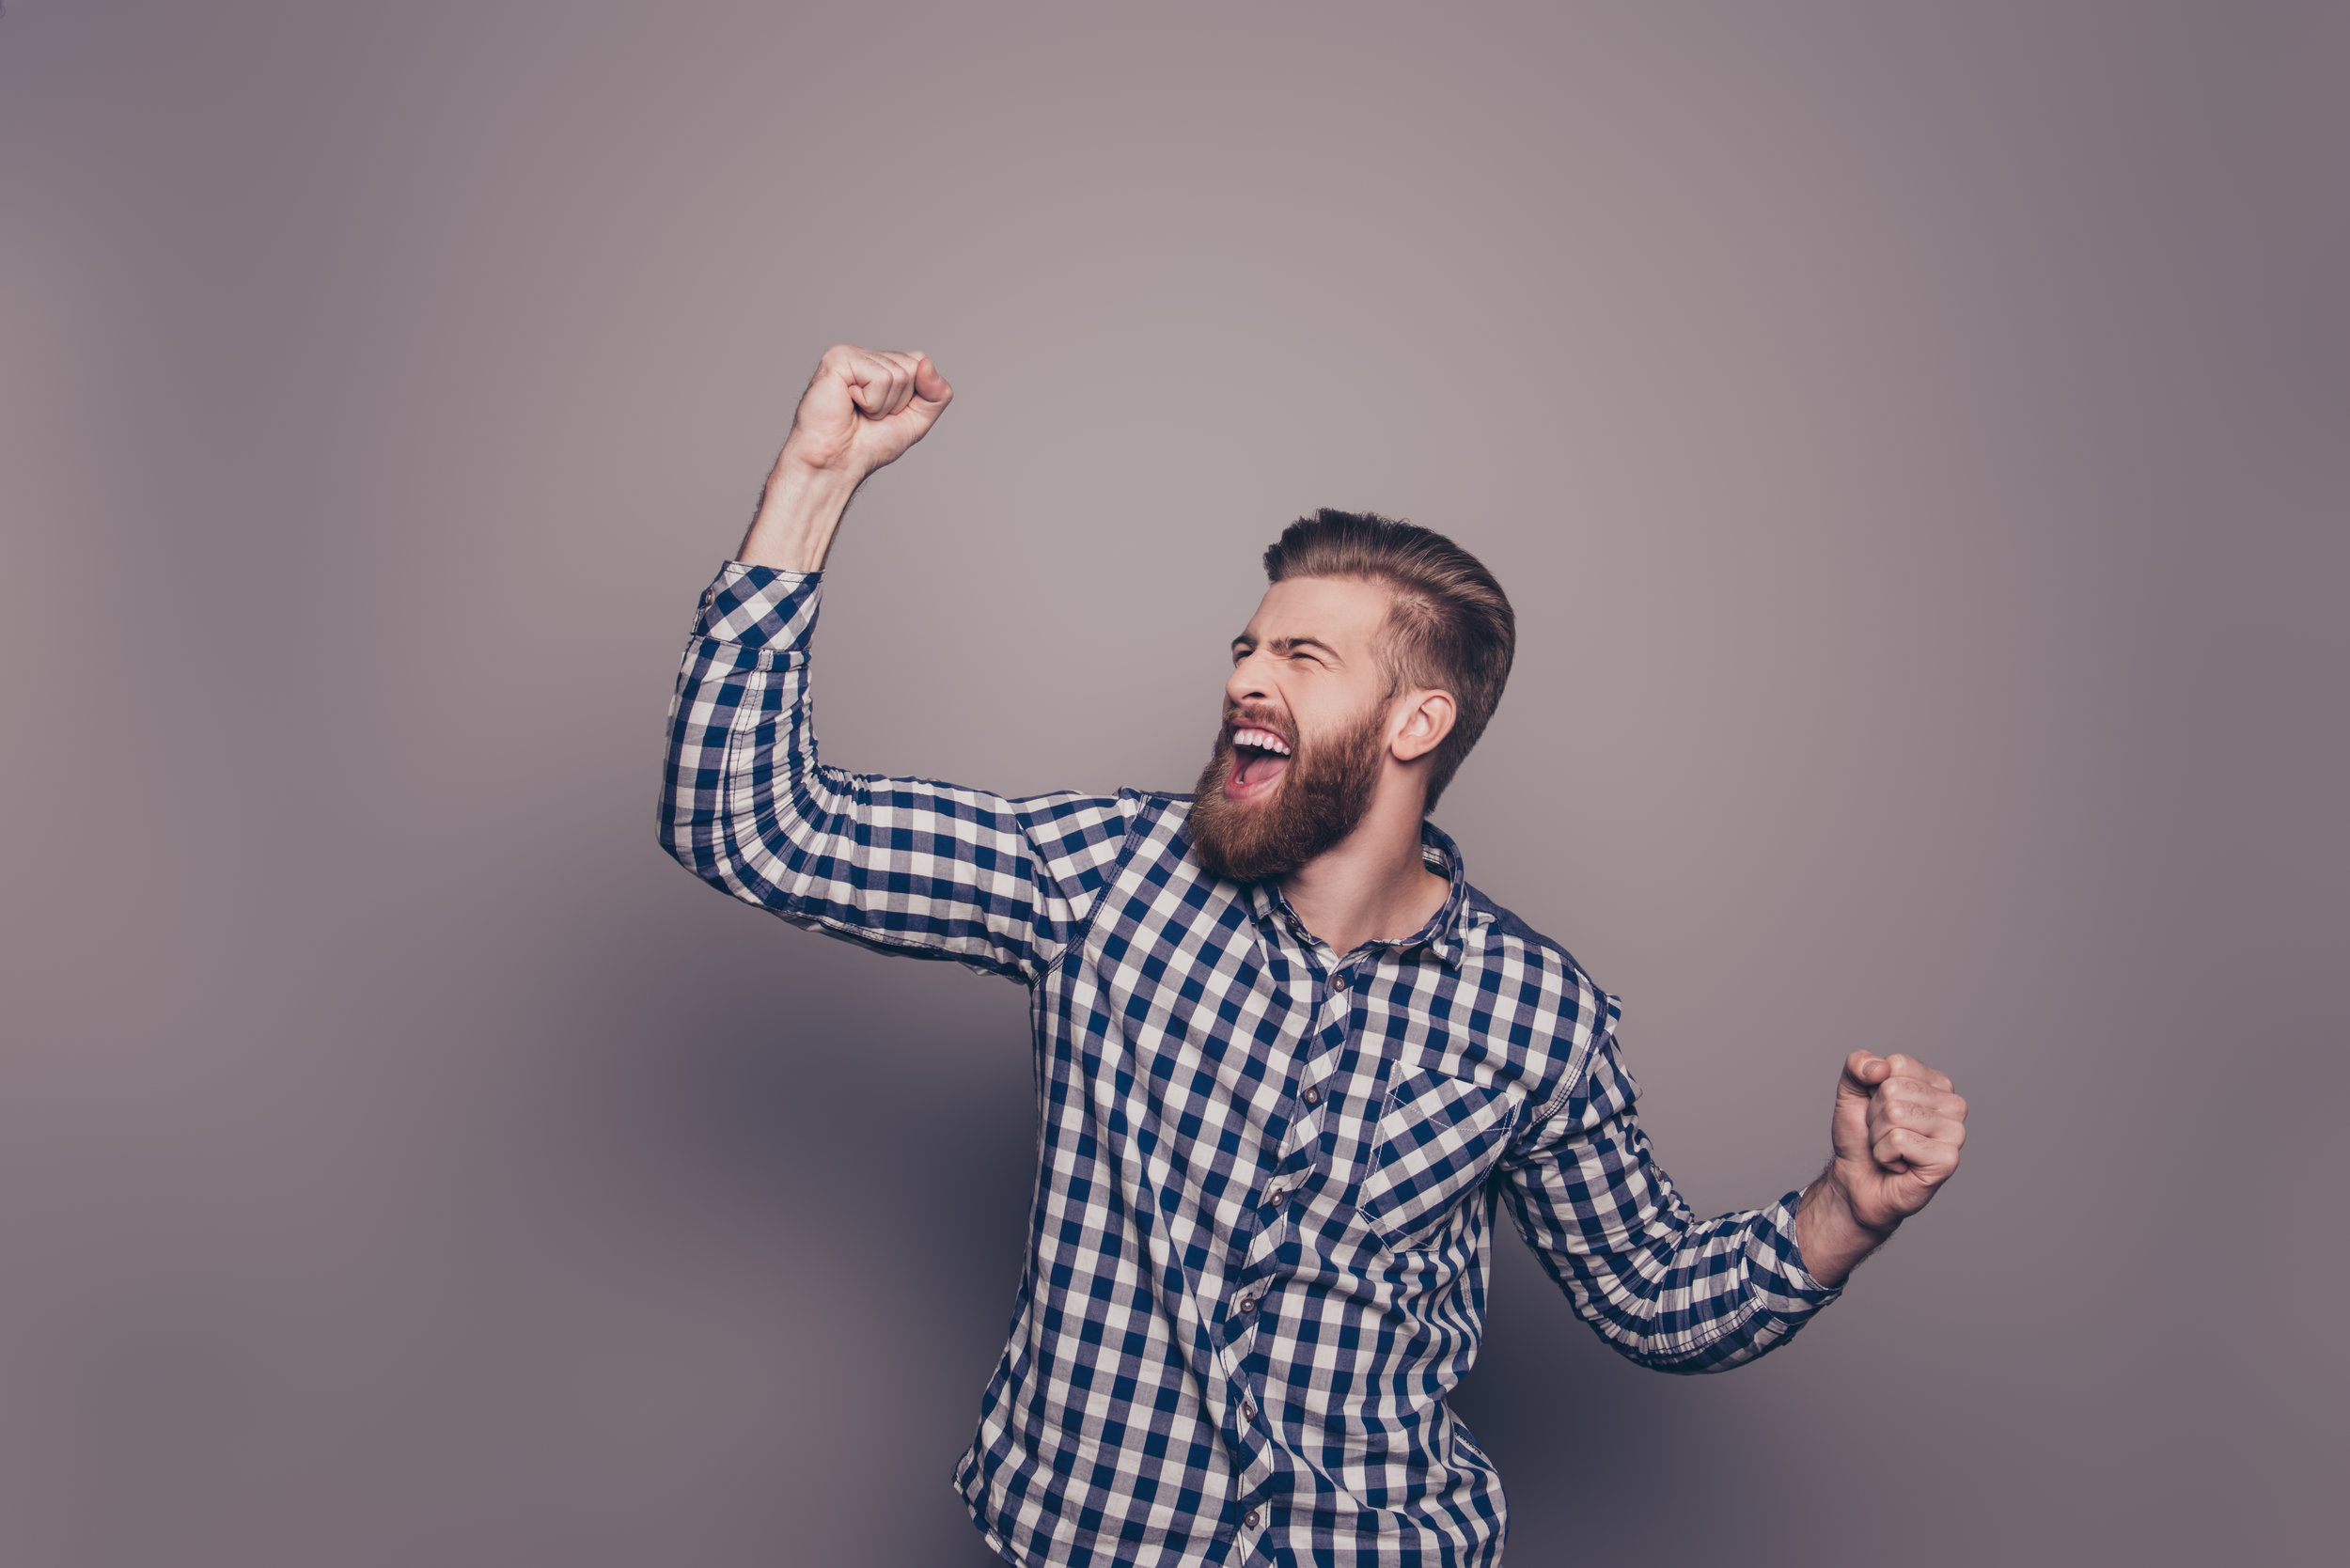 Yes,-he-did-it!--happy-bearded-man-raised-hands-636831346_7360x4912.jpeg